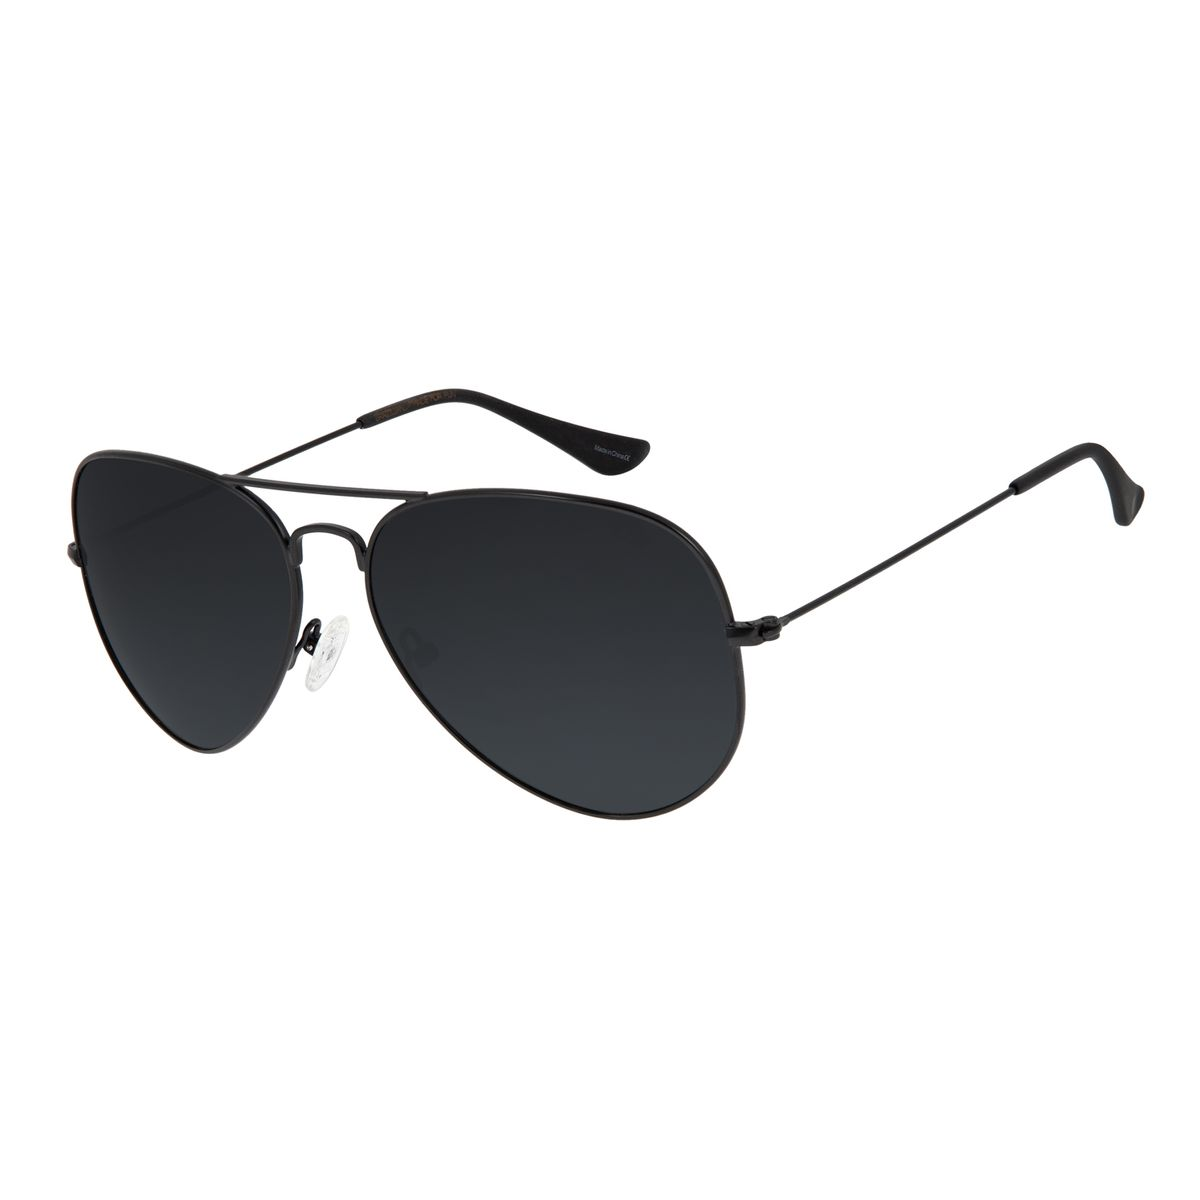 5b934daba609d Óculos de Sol Chilli Beans Aviador Unissex Preto Polarizado 2516 ...